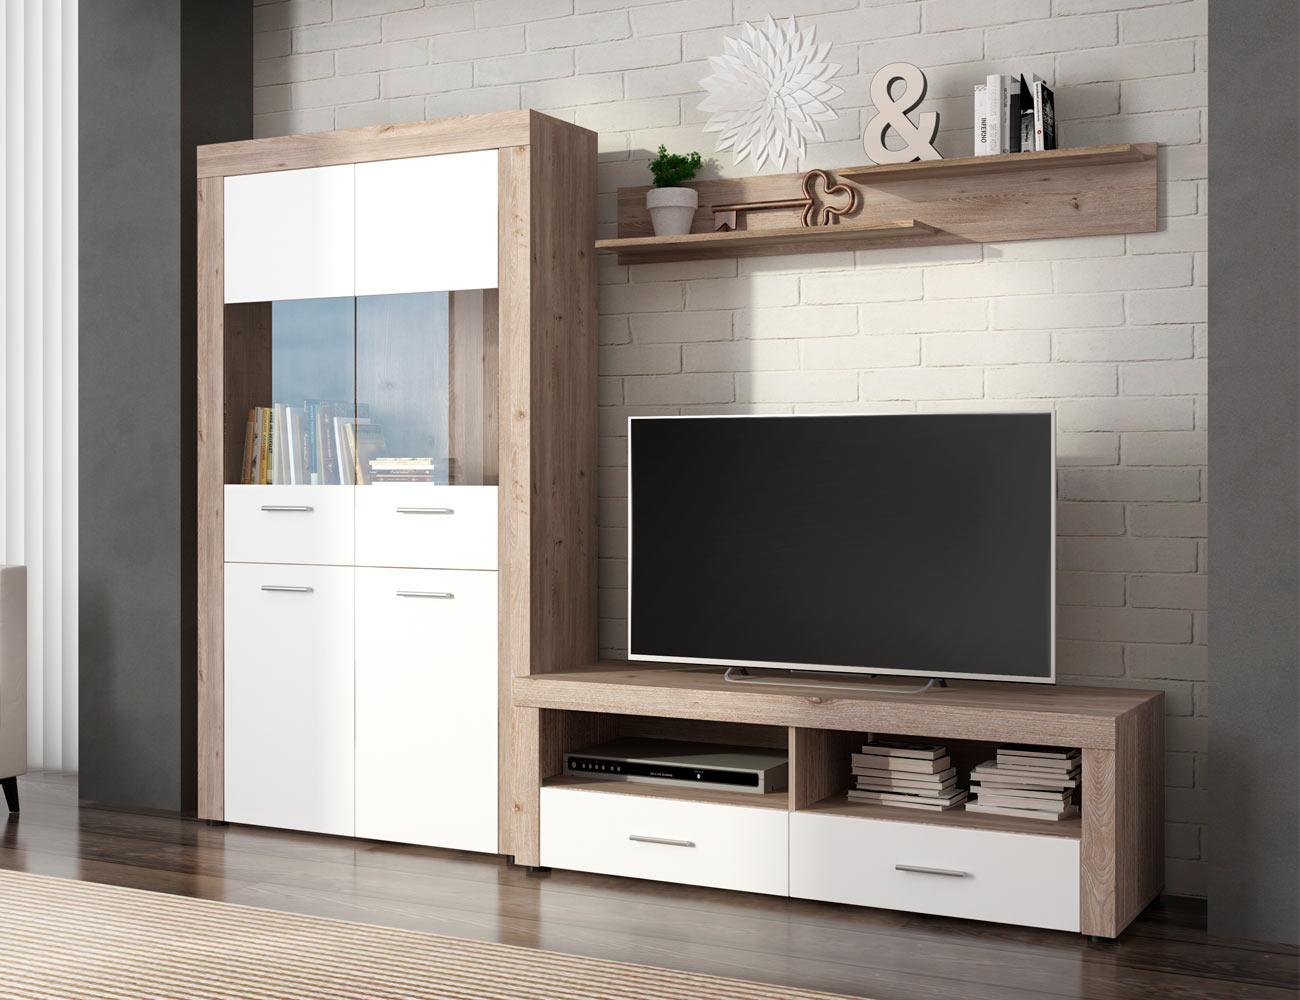 Mueble salon comedor vitrina bajo tv estante color cañon 235cm